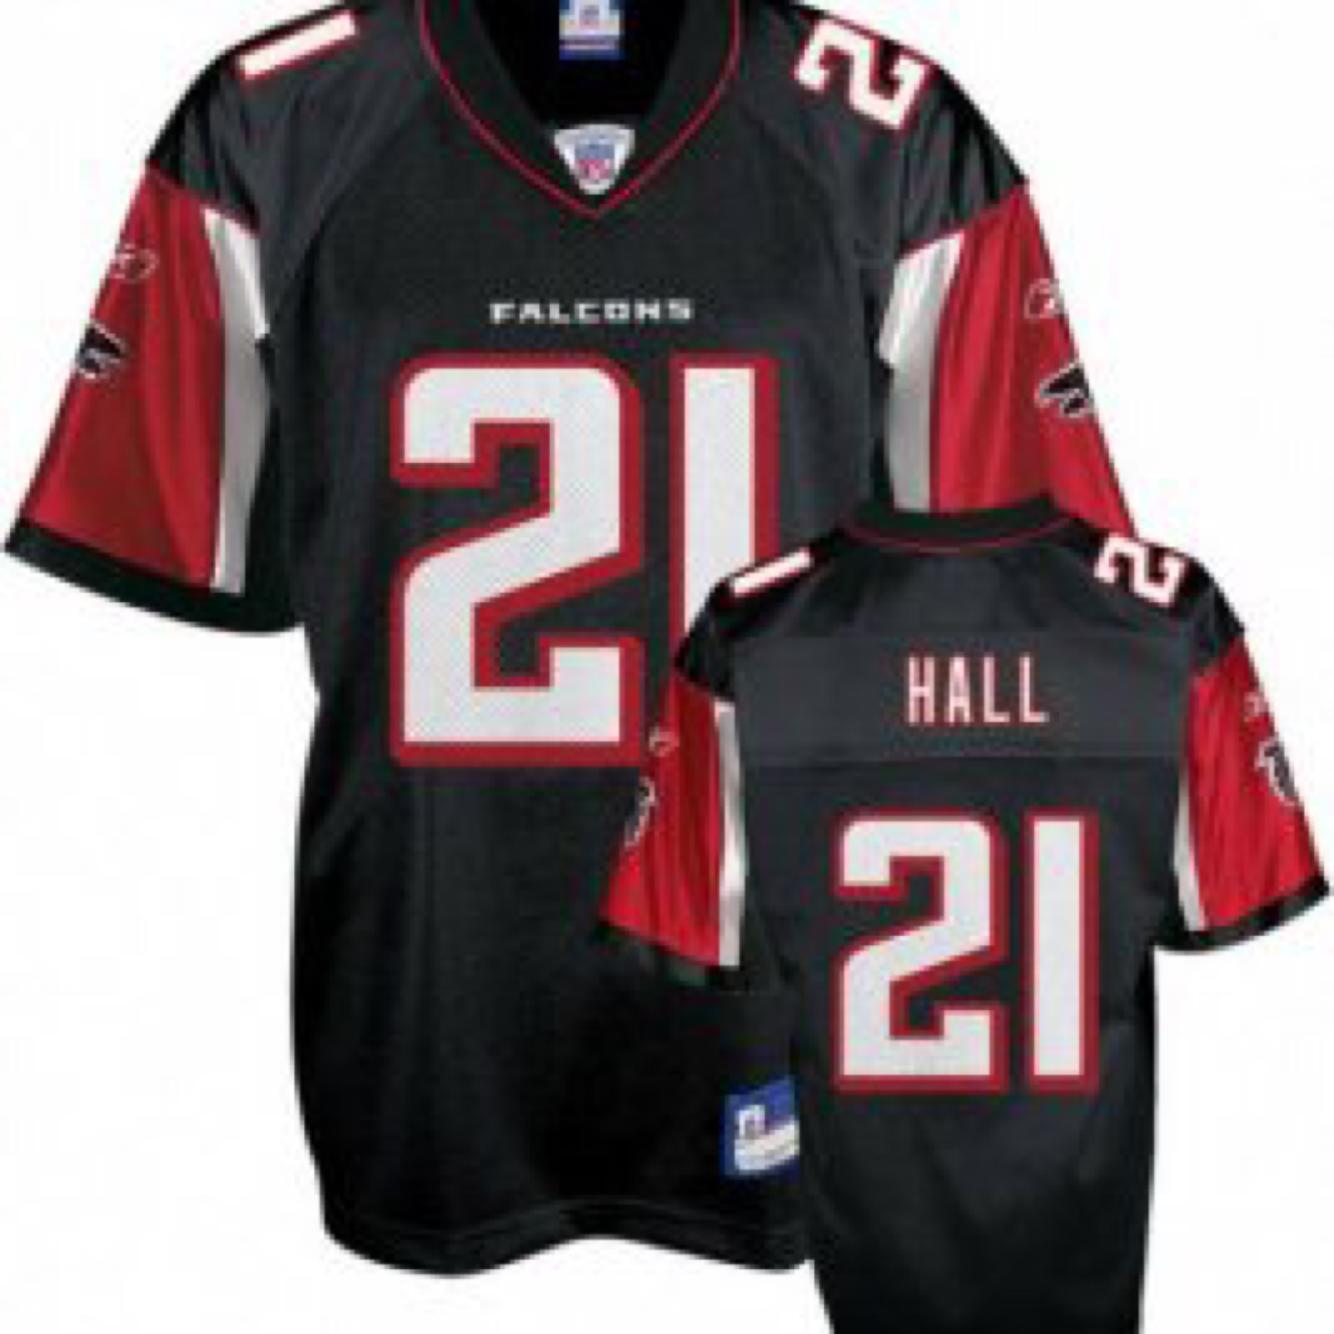 deangelo hall jersey